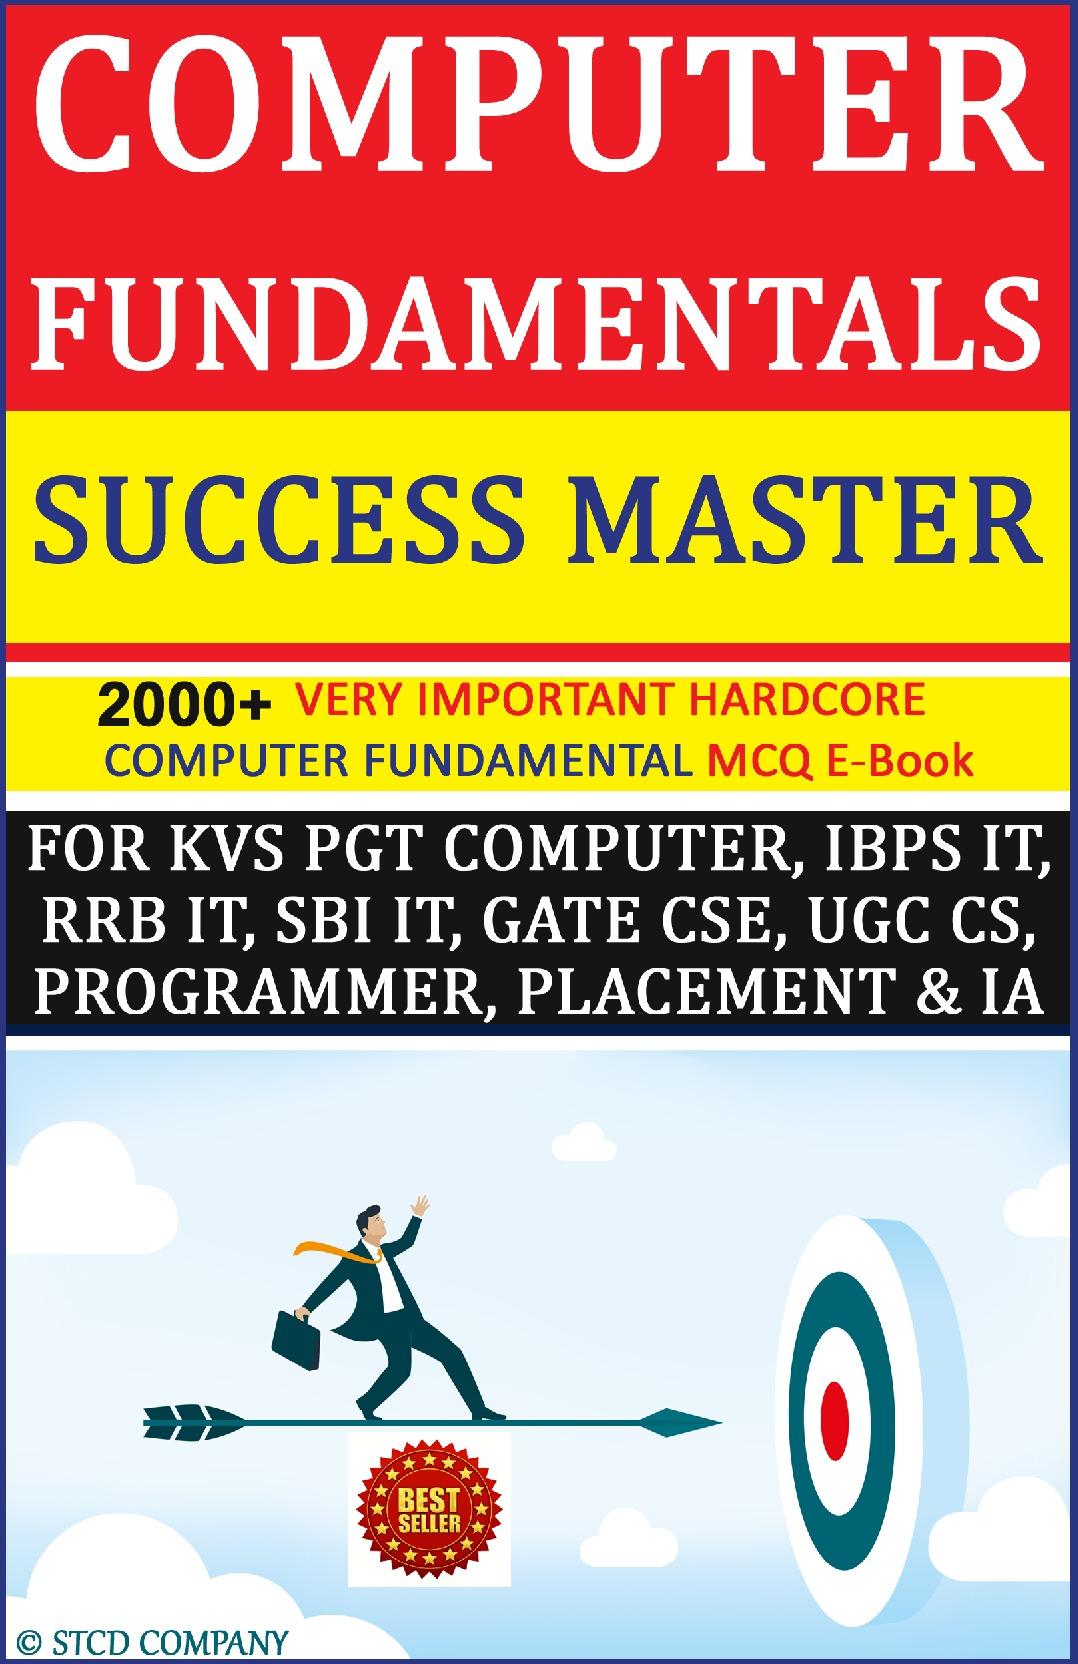 Computer Fundamentals Success Master Edition- - 2000+